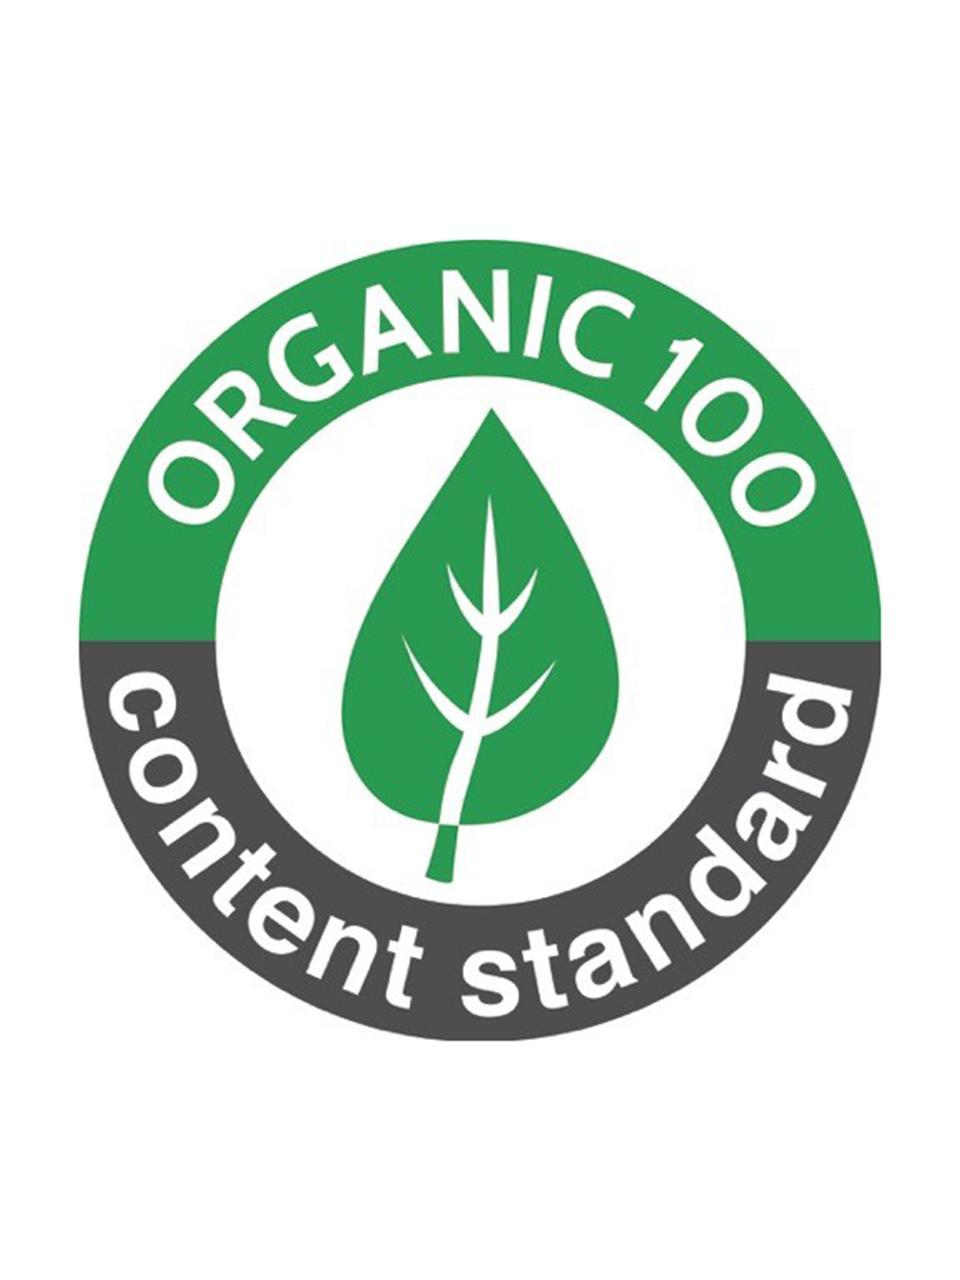 U-Heft-Hülle Pressed Leaves aus Bio-Baumwolle, 100% Biobaumwolle, OCS-zertifiziert, Rosa, Mehrfarbig, 15 x 21 cm